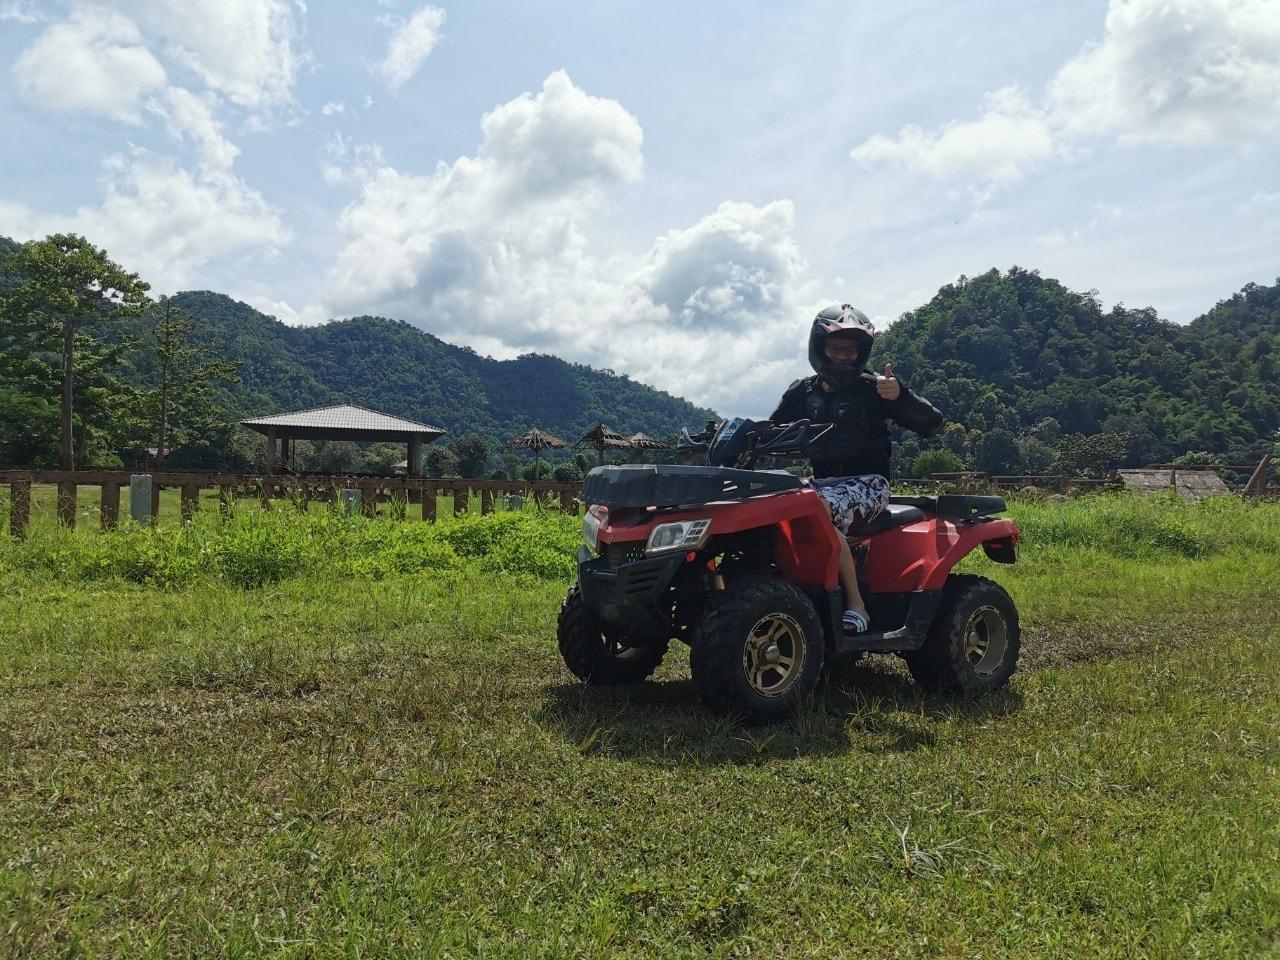 Elephant Sanctuary Adventure and ATV